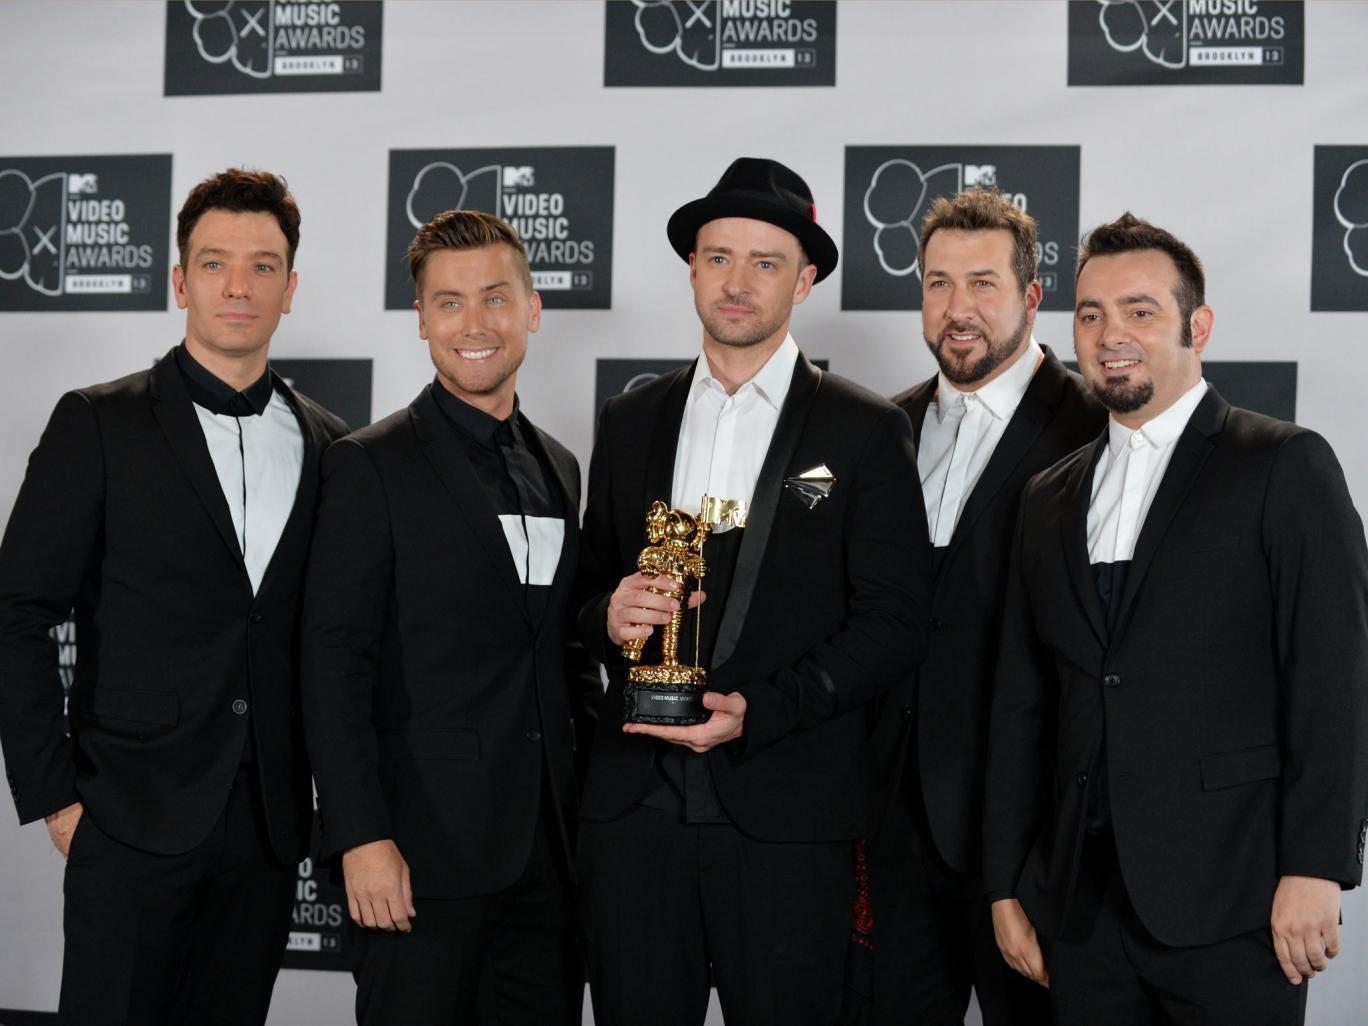 'N Sync pose with Justin and his Michael Jackson Video Vangard Award at Sunday's MTV Video Music Awards